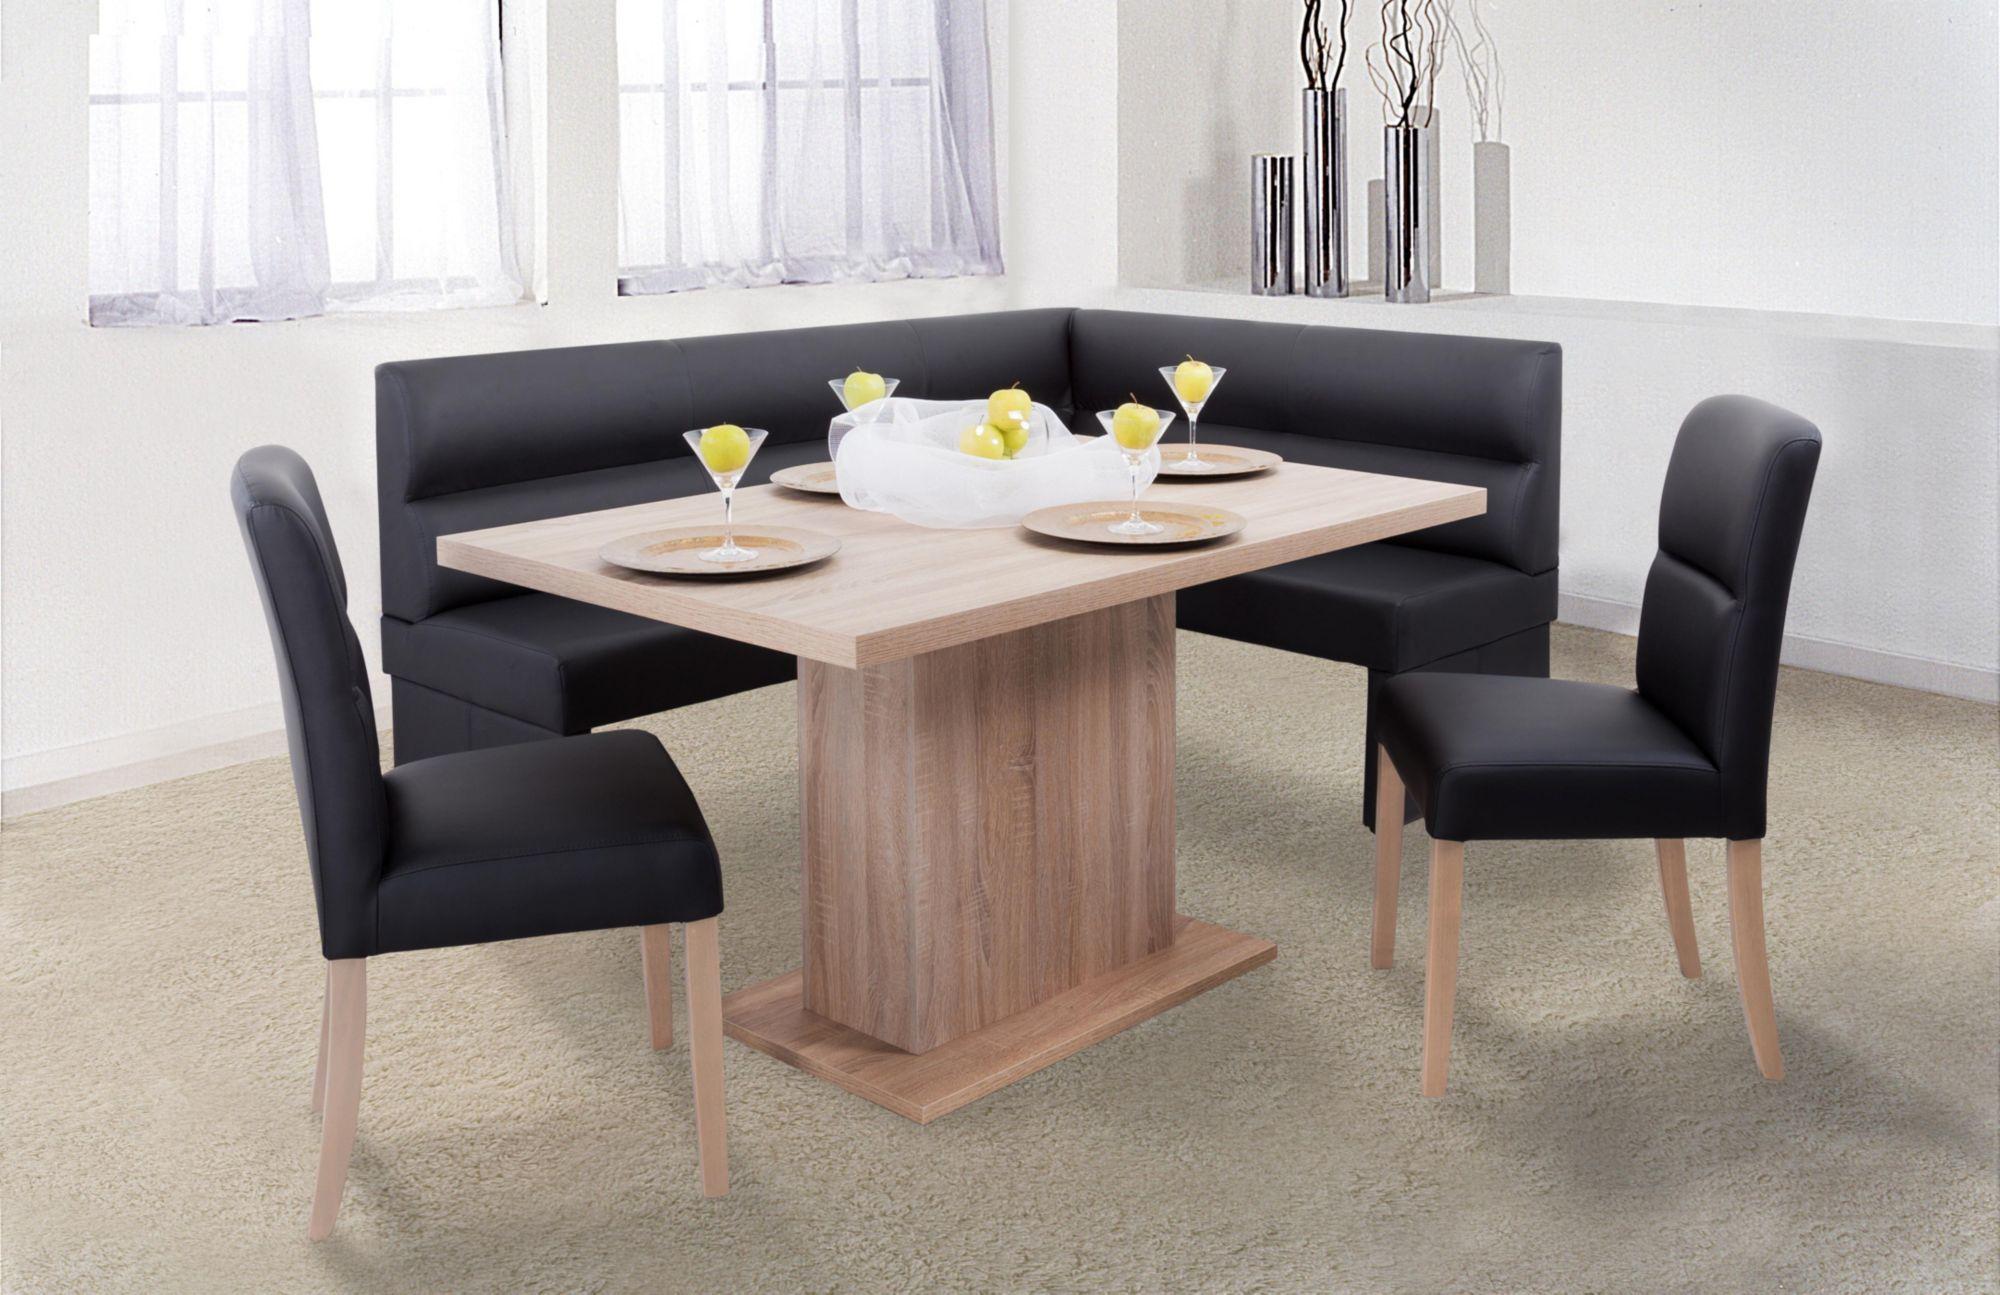 eckbankgruppe g nstig online kaufen beim schwab versand. Black Bedroom Furniture Sets. Home Design Ideas